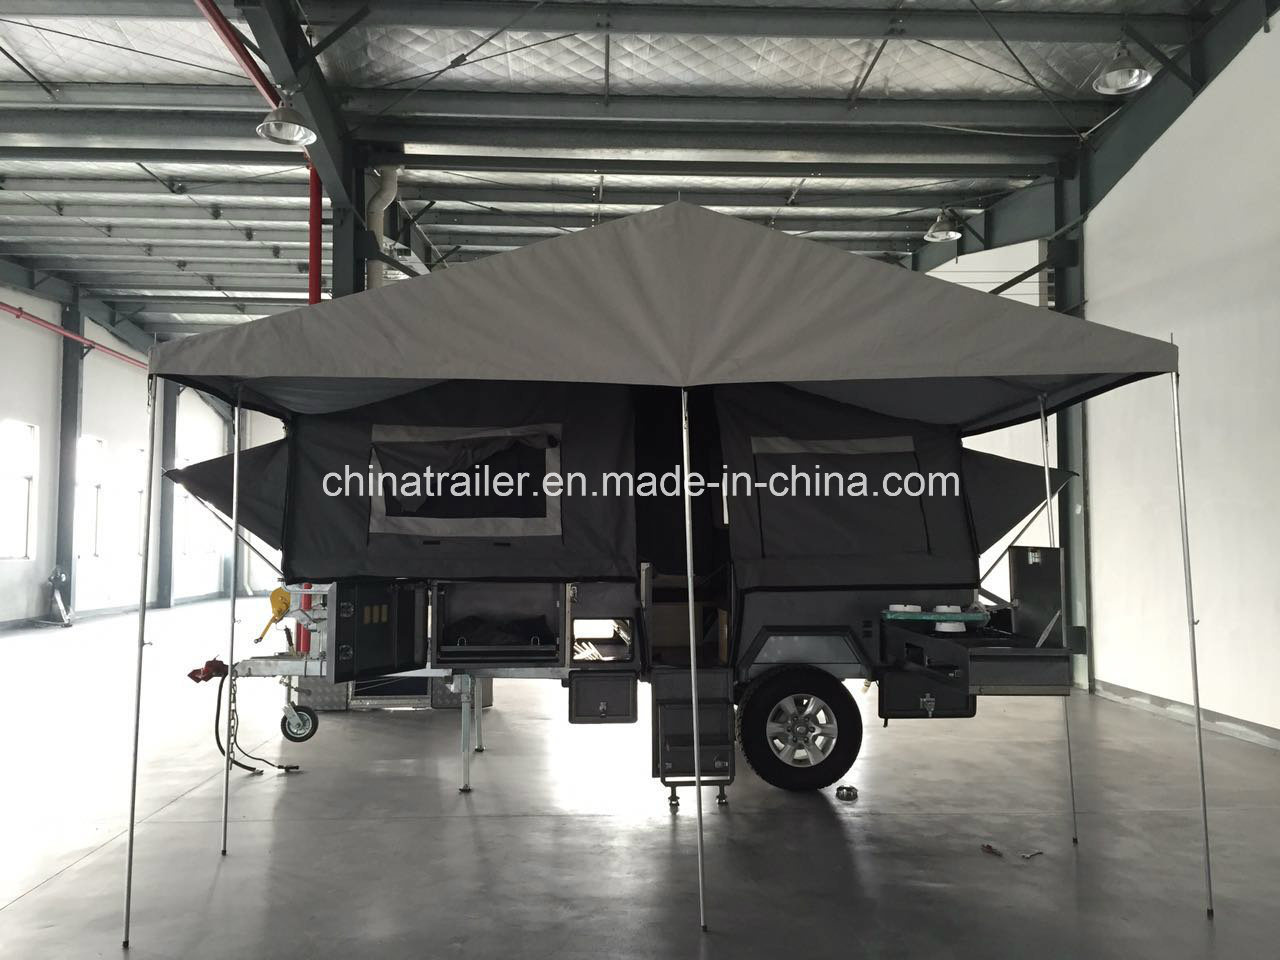 Hard Floor Forward Folding Camper Trailer with Adr Certificate